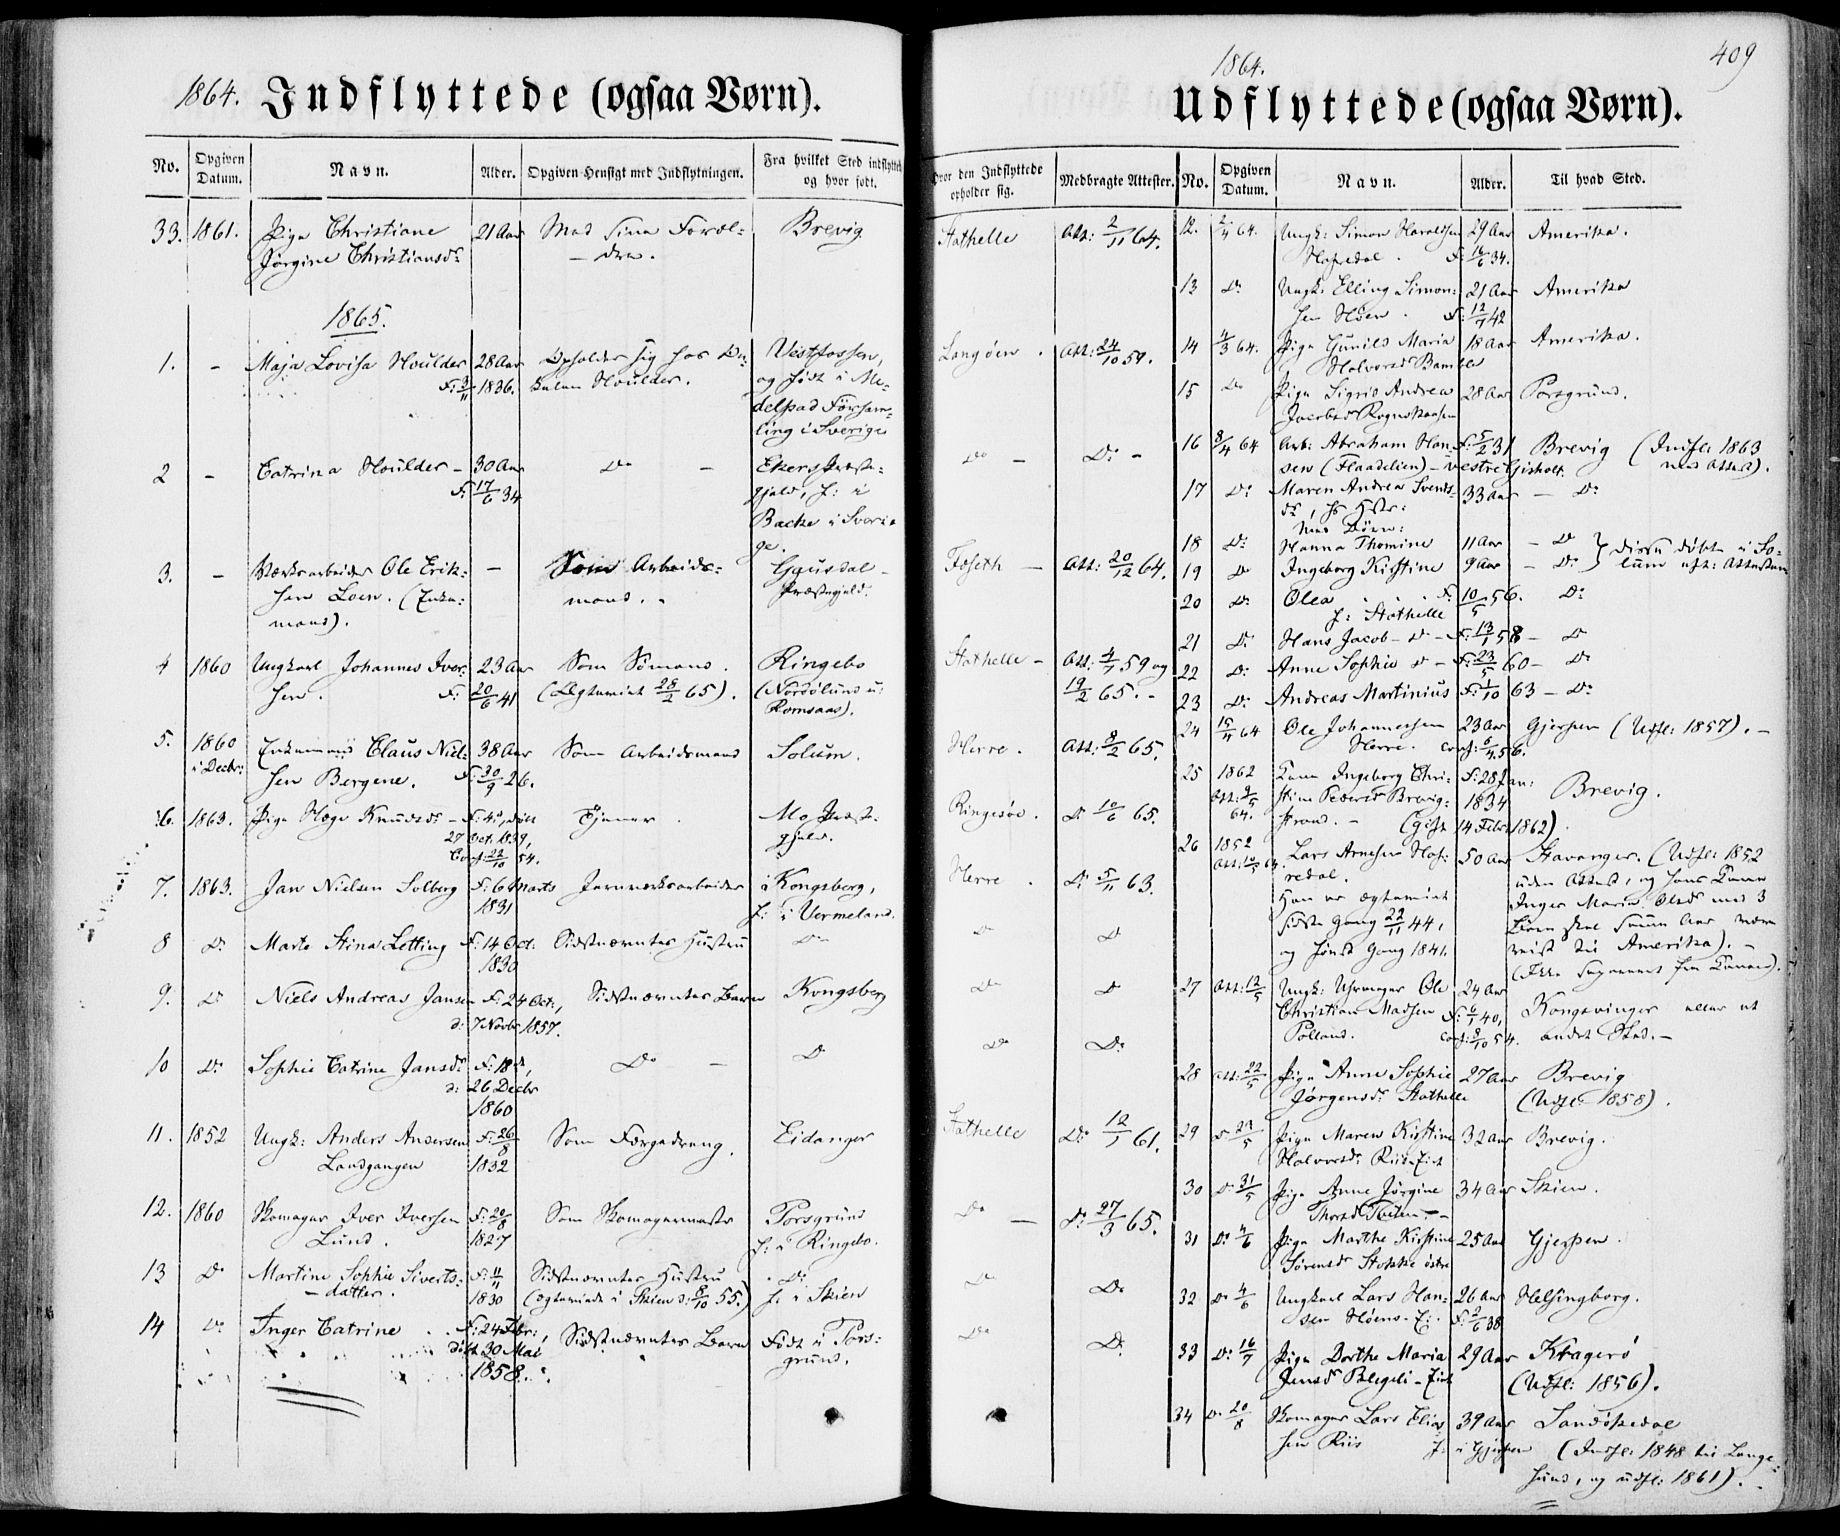 SAKO, Bamble kirkebøker, F/Fa/L0005: Ministerialbok nr. I 5, 1854-1869, s. 409